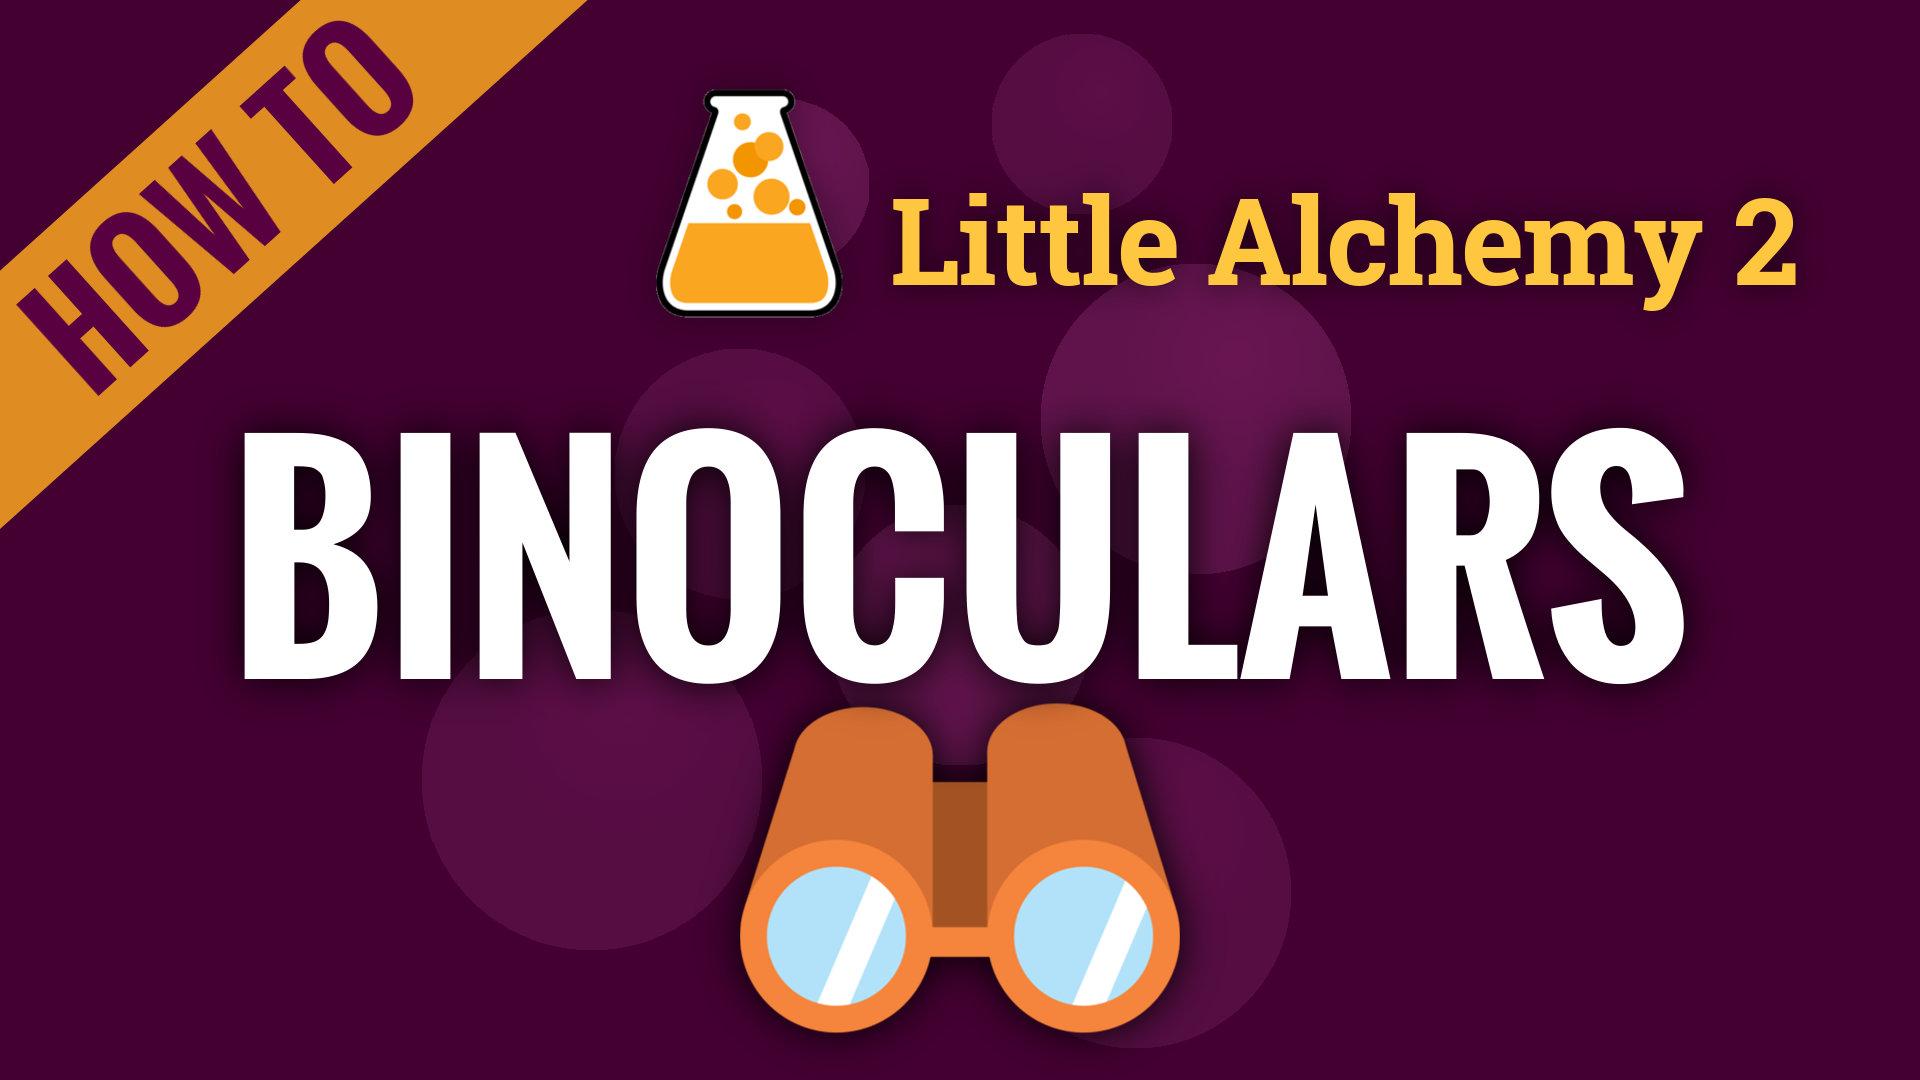 binoculars  little alchemy 2 cheats